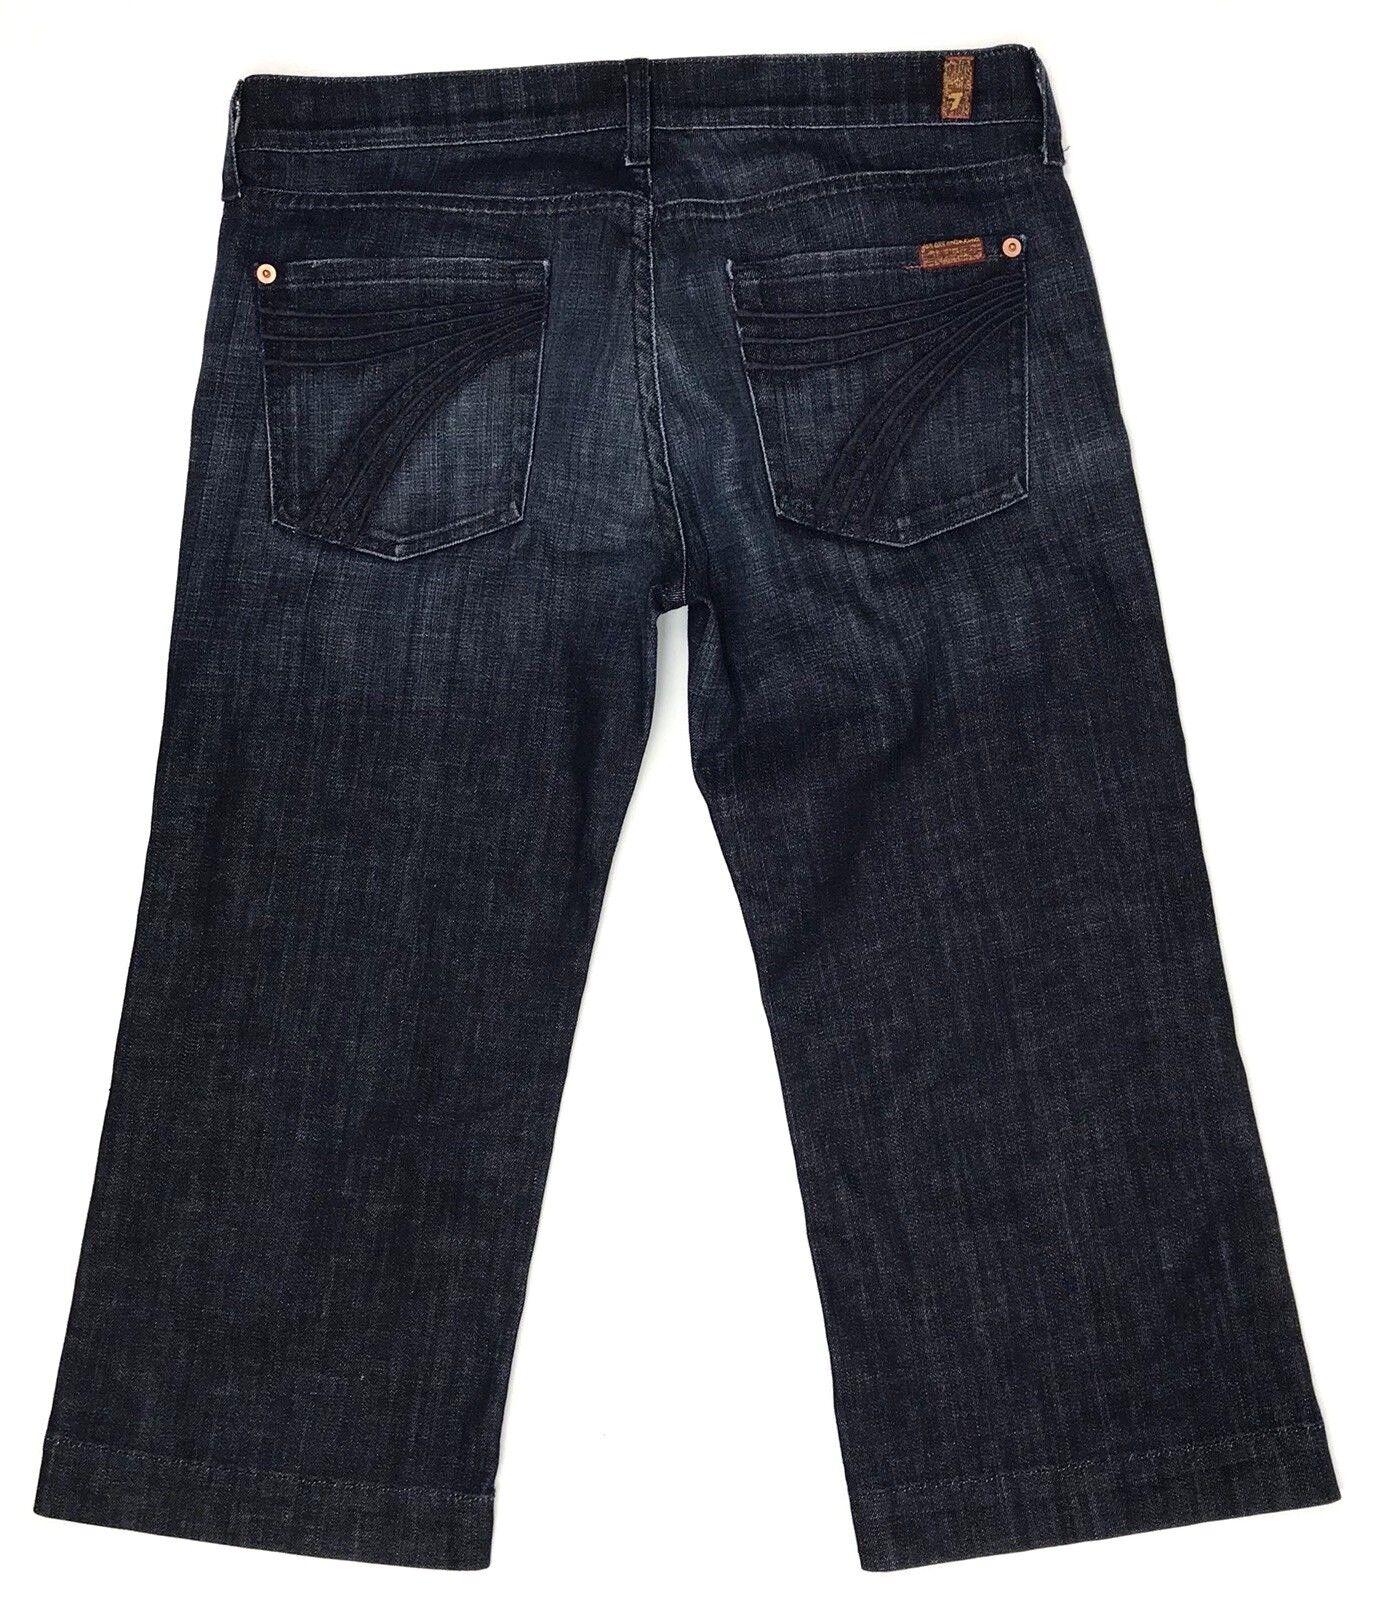 7 for All Mankind Crop Dojo Jeans Womens Size 30 Stretch Denim